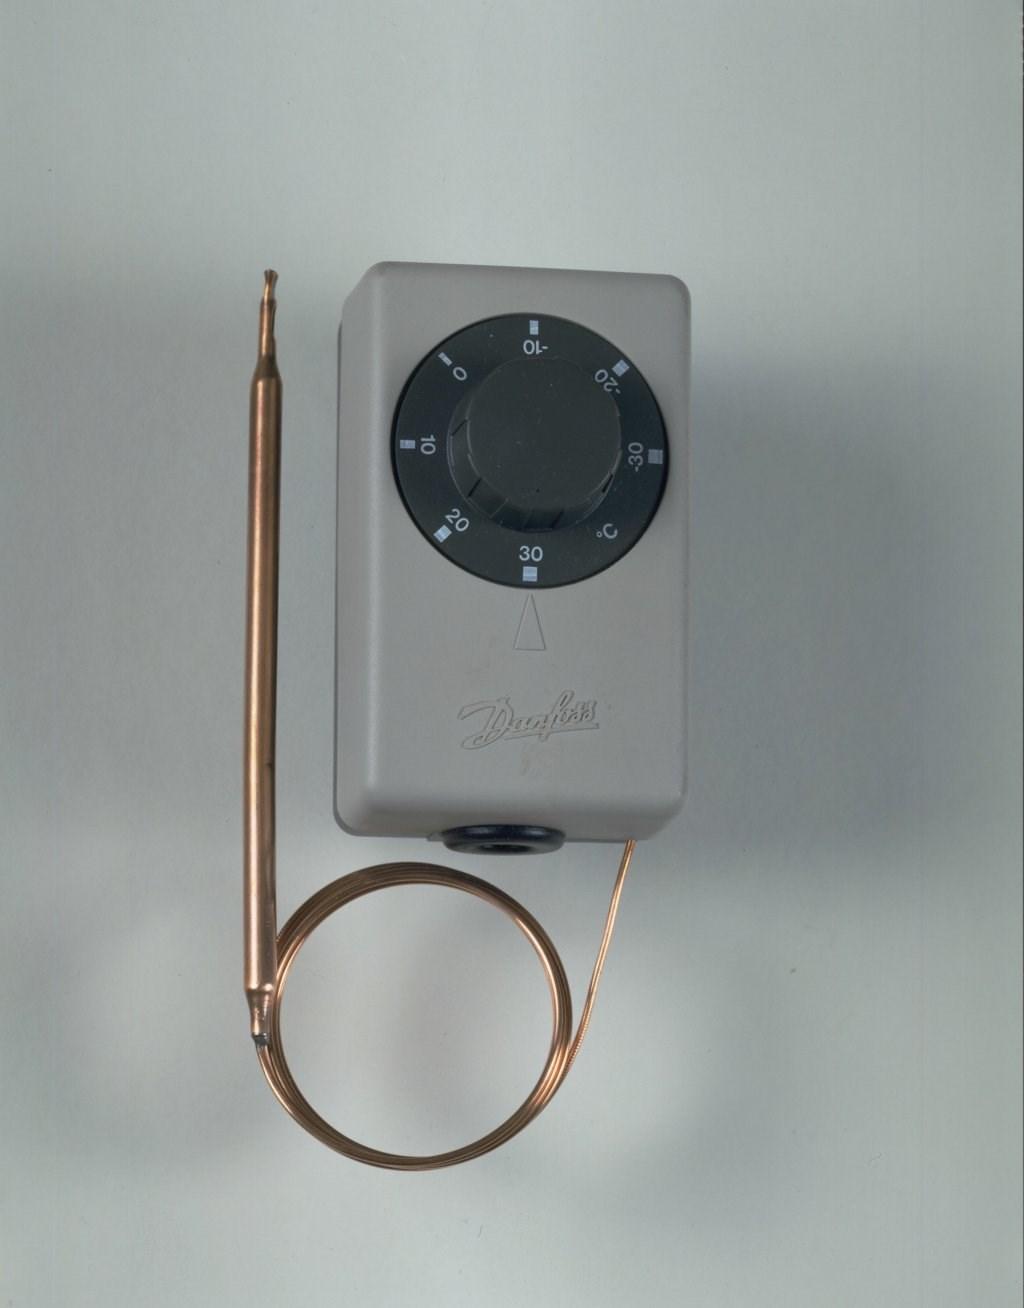 ut universal thermostat kupfer kapillarf hler visuals. Black Bedroom Furniture Sets. Home Design Ideas